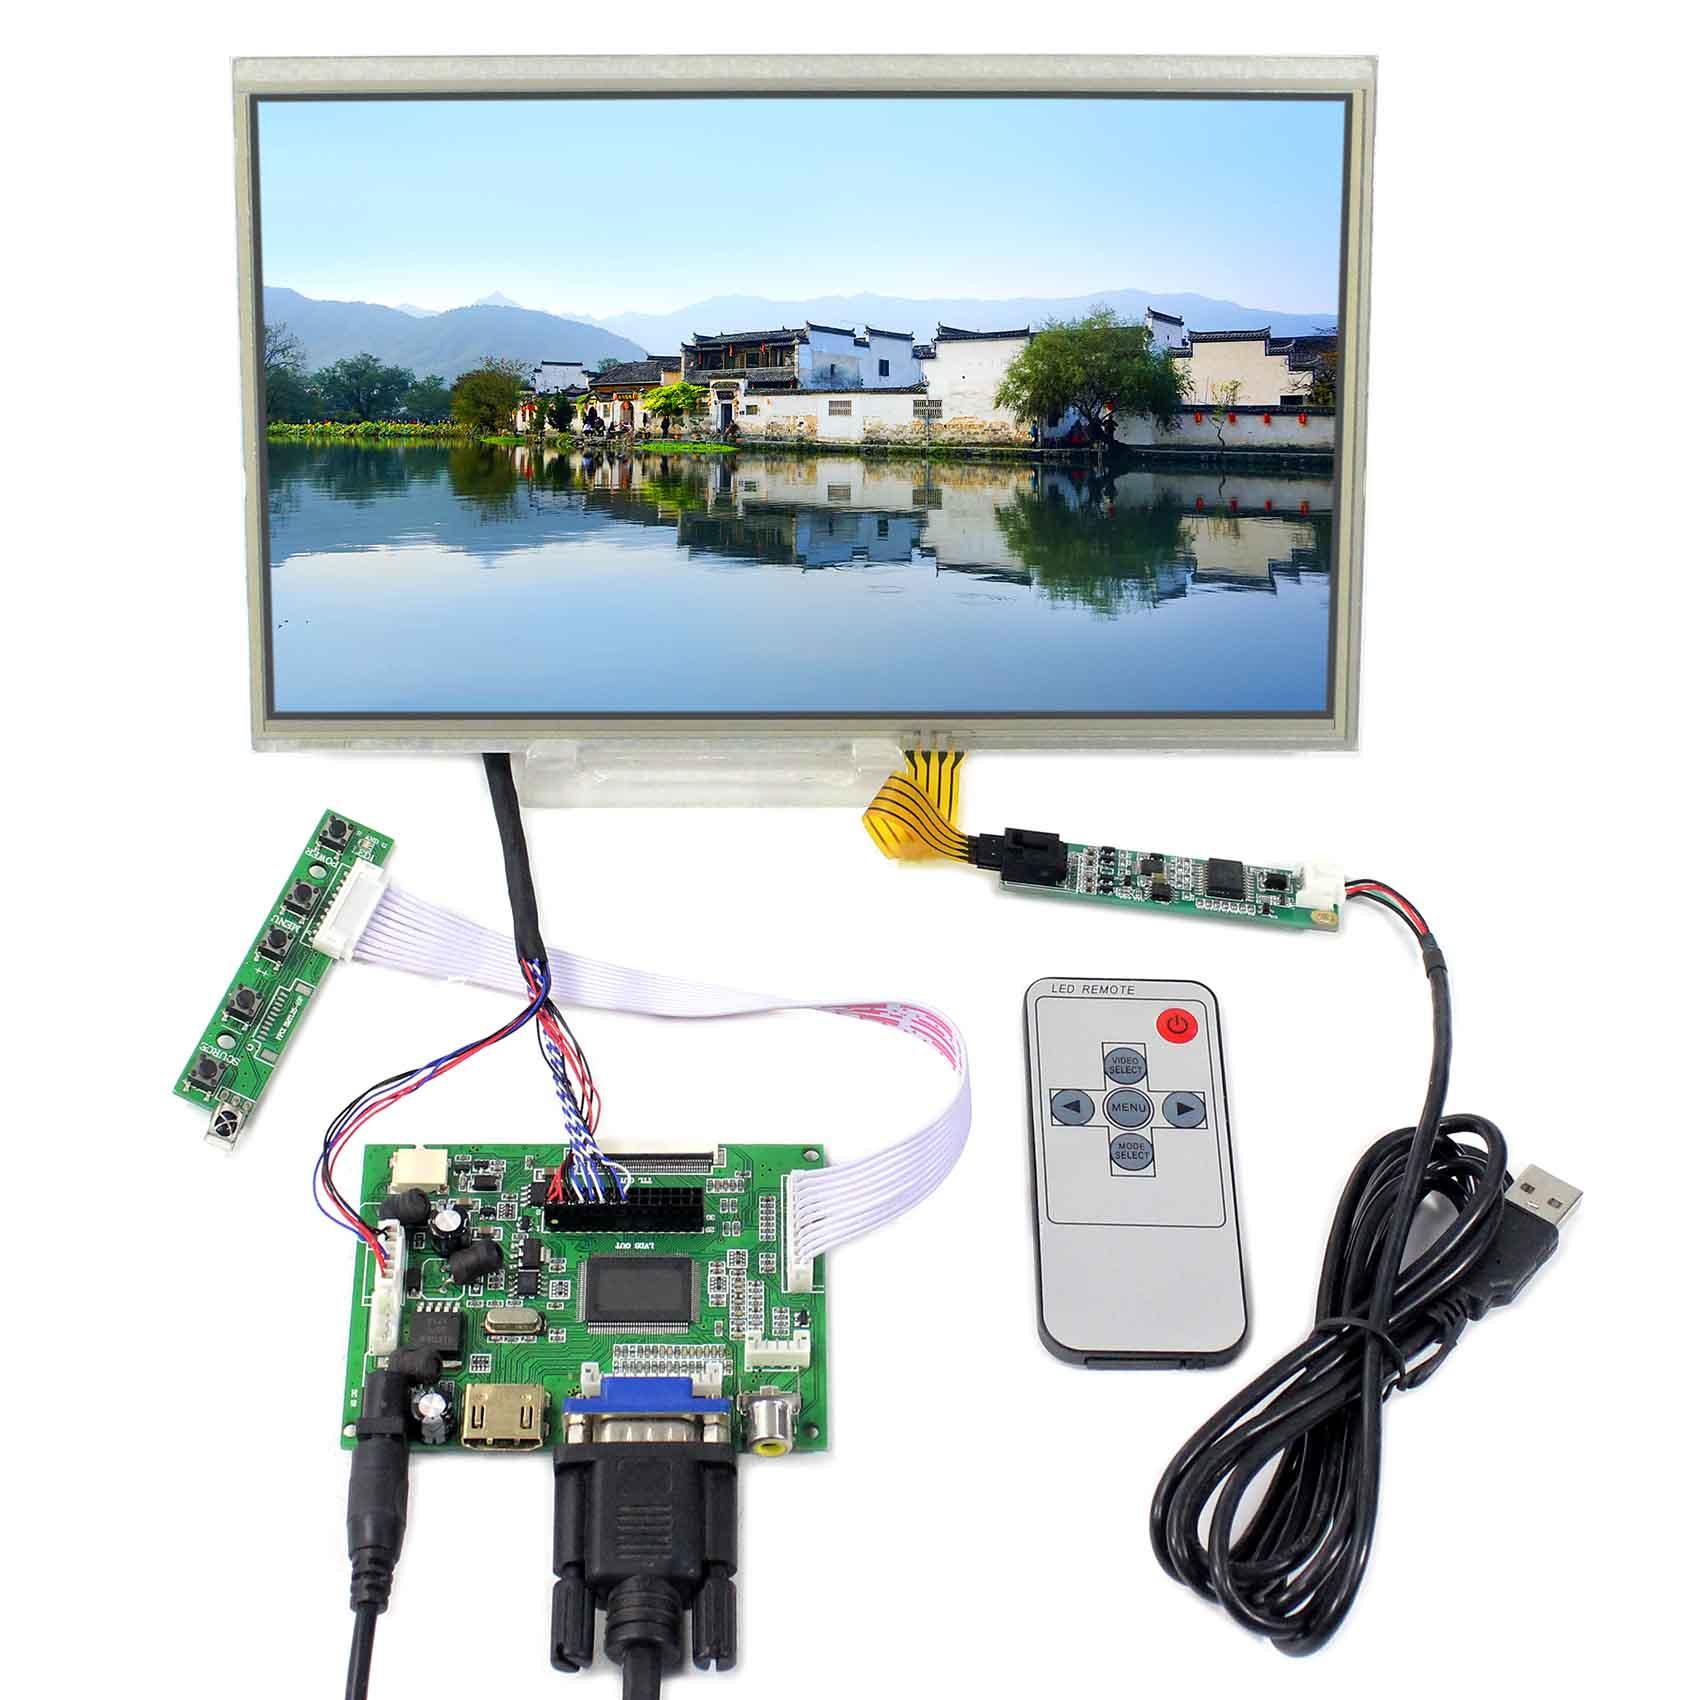 10.1 Tocuh LCD ekran 1024x600 LTN101NT02 B101AW03 N101L6 HDMI DVI VGA LCD Kurulu 10.1 LCD Ekran10.1 Tocuh LCD ekran 1024x600 LTN101NT02 B101AW03 N101L6 HDMI DVI VGA LCD Kurulu 10.1 LCD Ekran